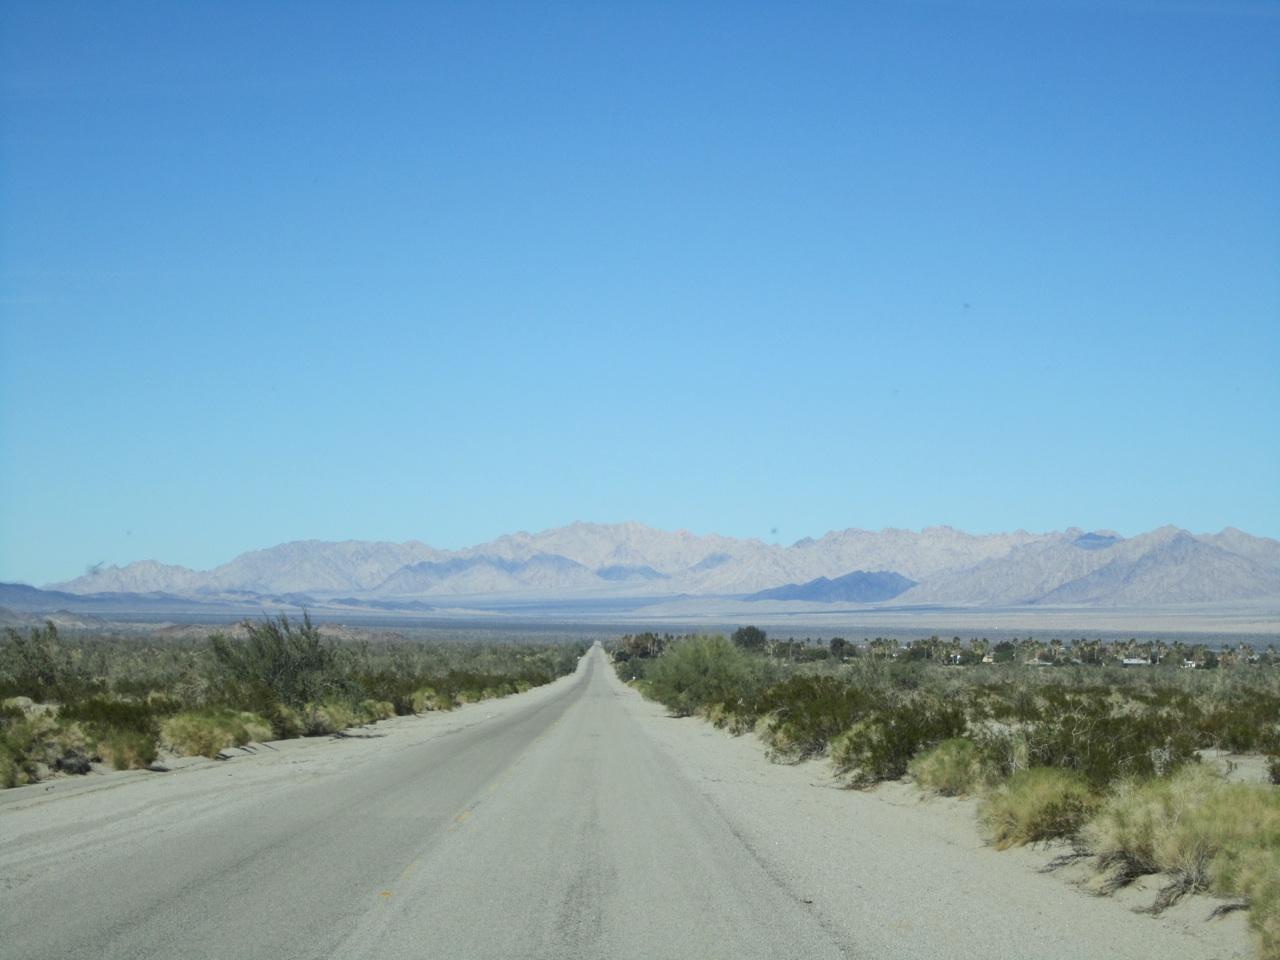 The Road Heading To Lake Tamarisk RV Resort You Start Wonder What Got